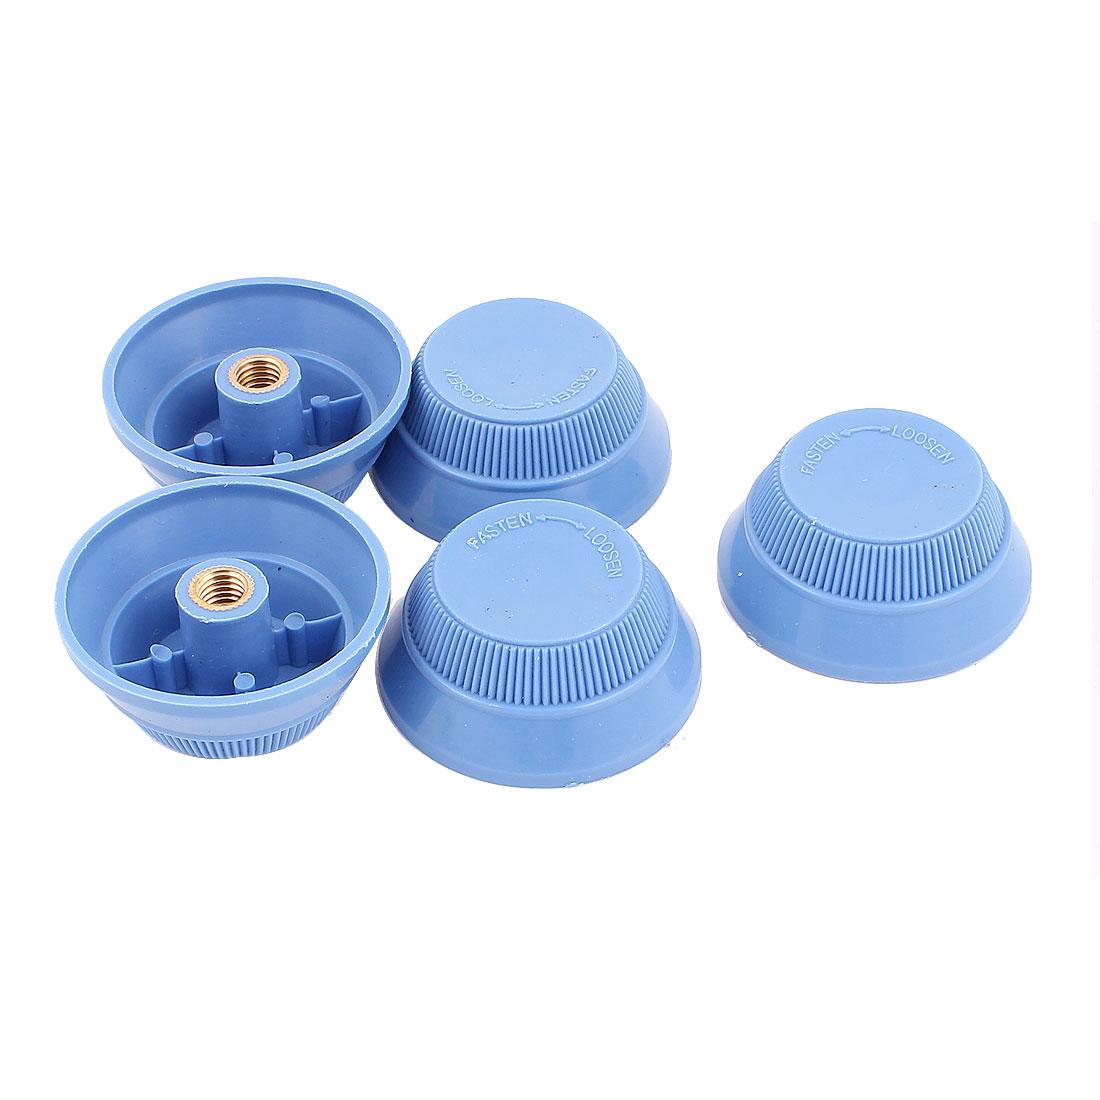 5pcs 7mm Female Thread Blue Plastic Desk Electric Fan Vane Rotary Nuts